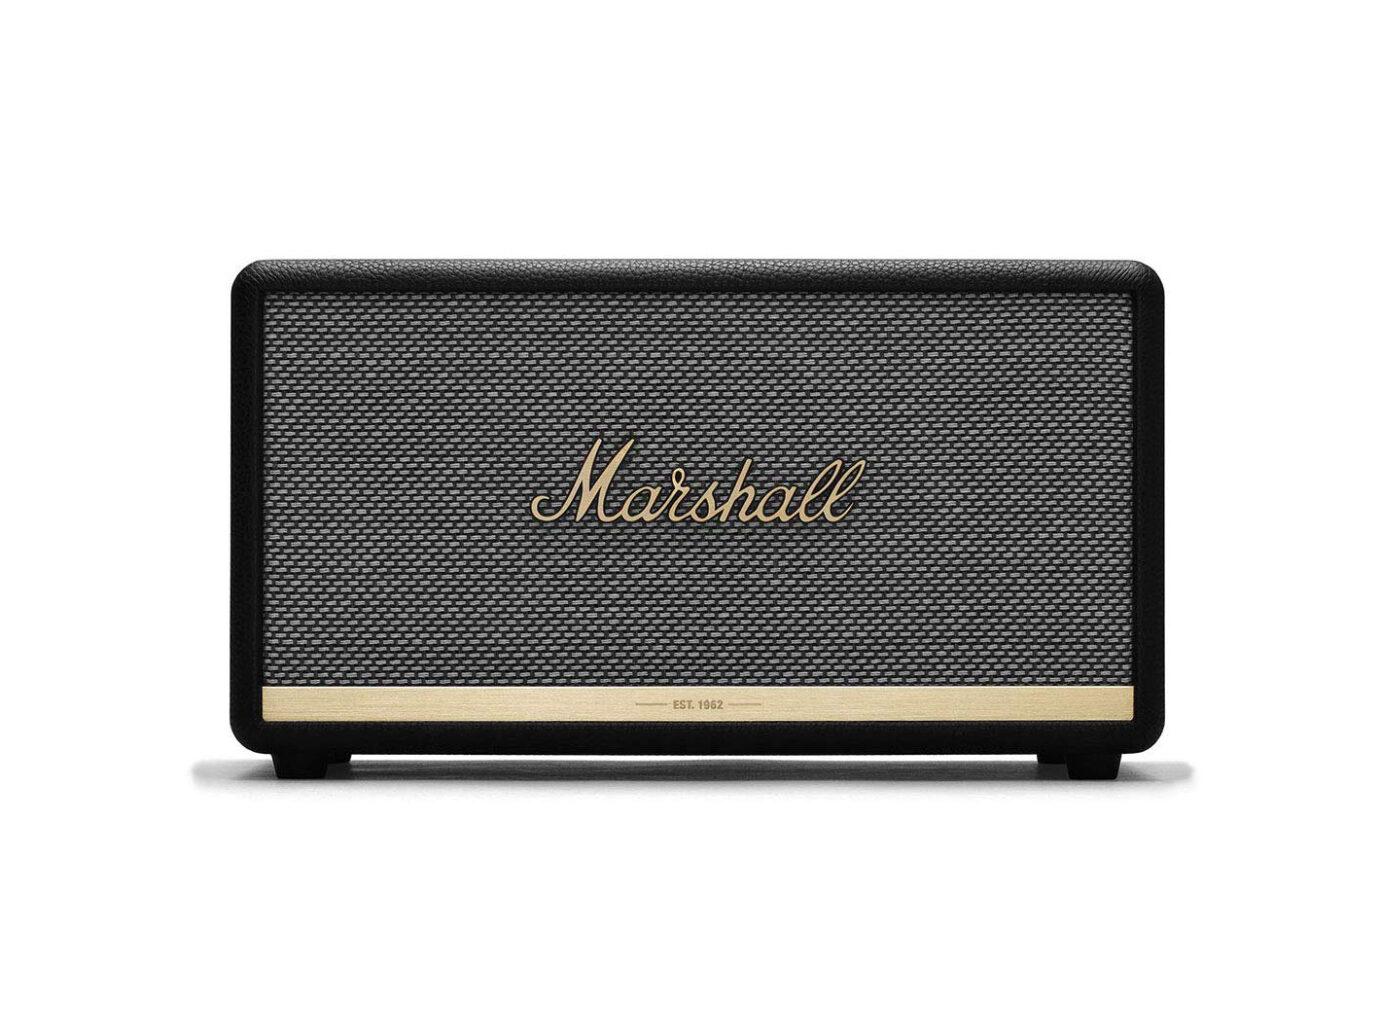 The Marshall Stanmore Wireless Bluetooth Speaker